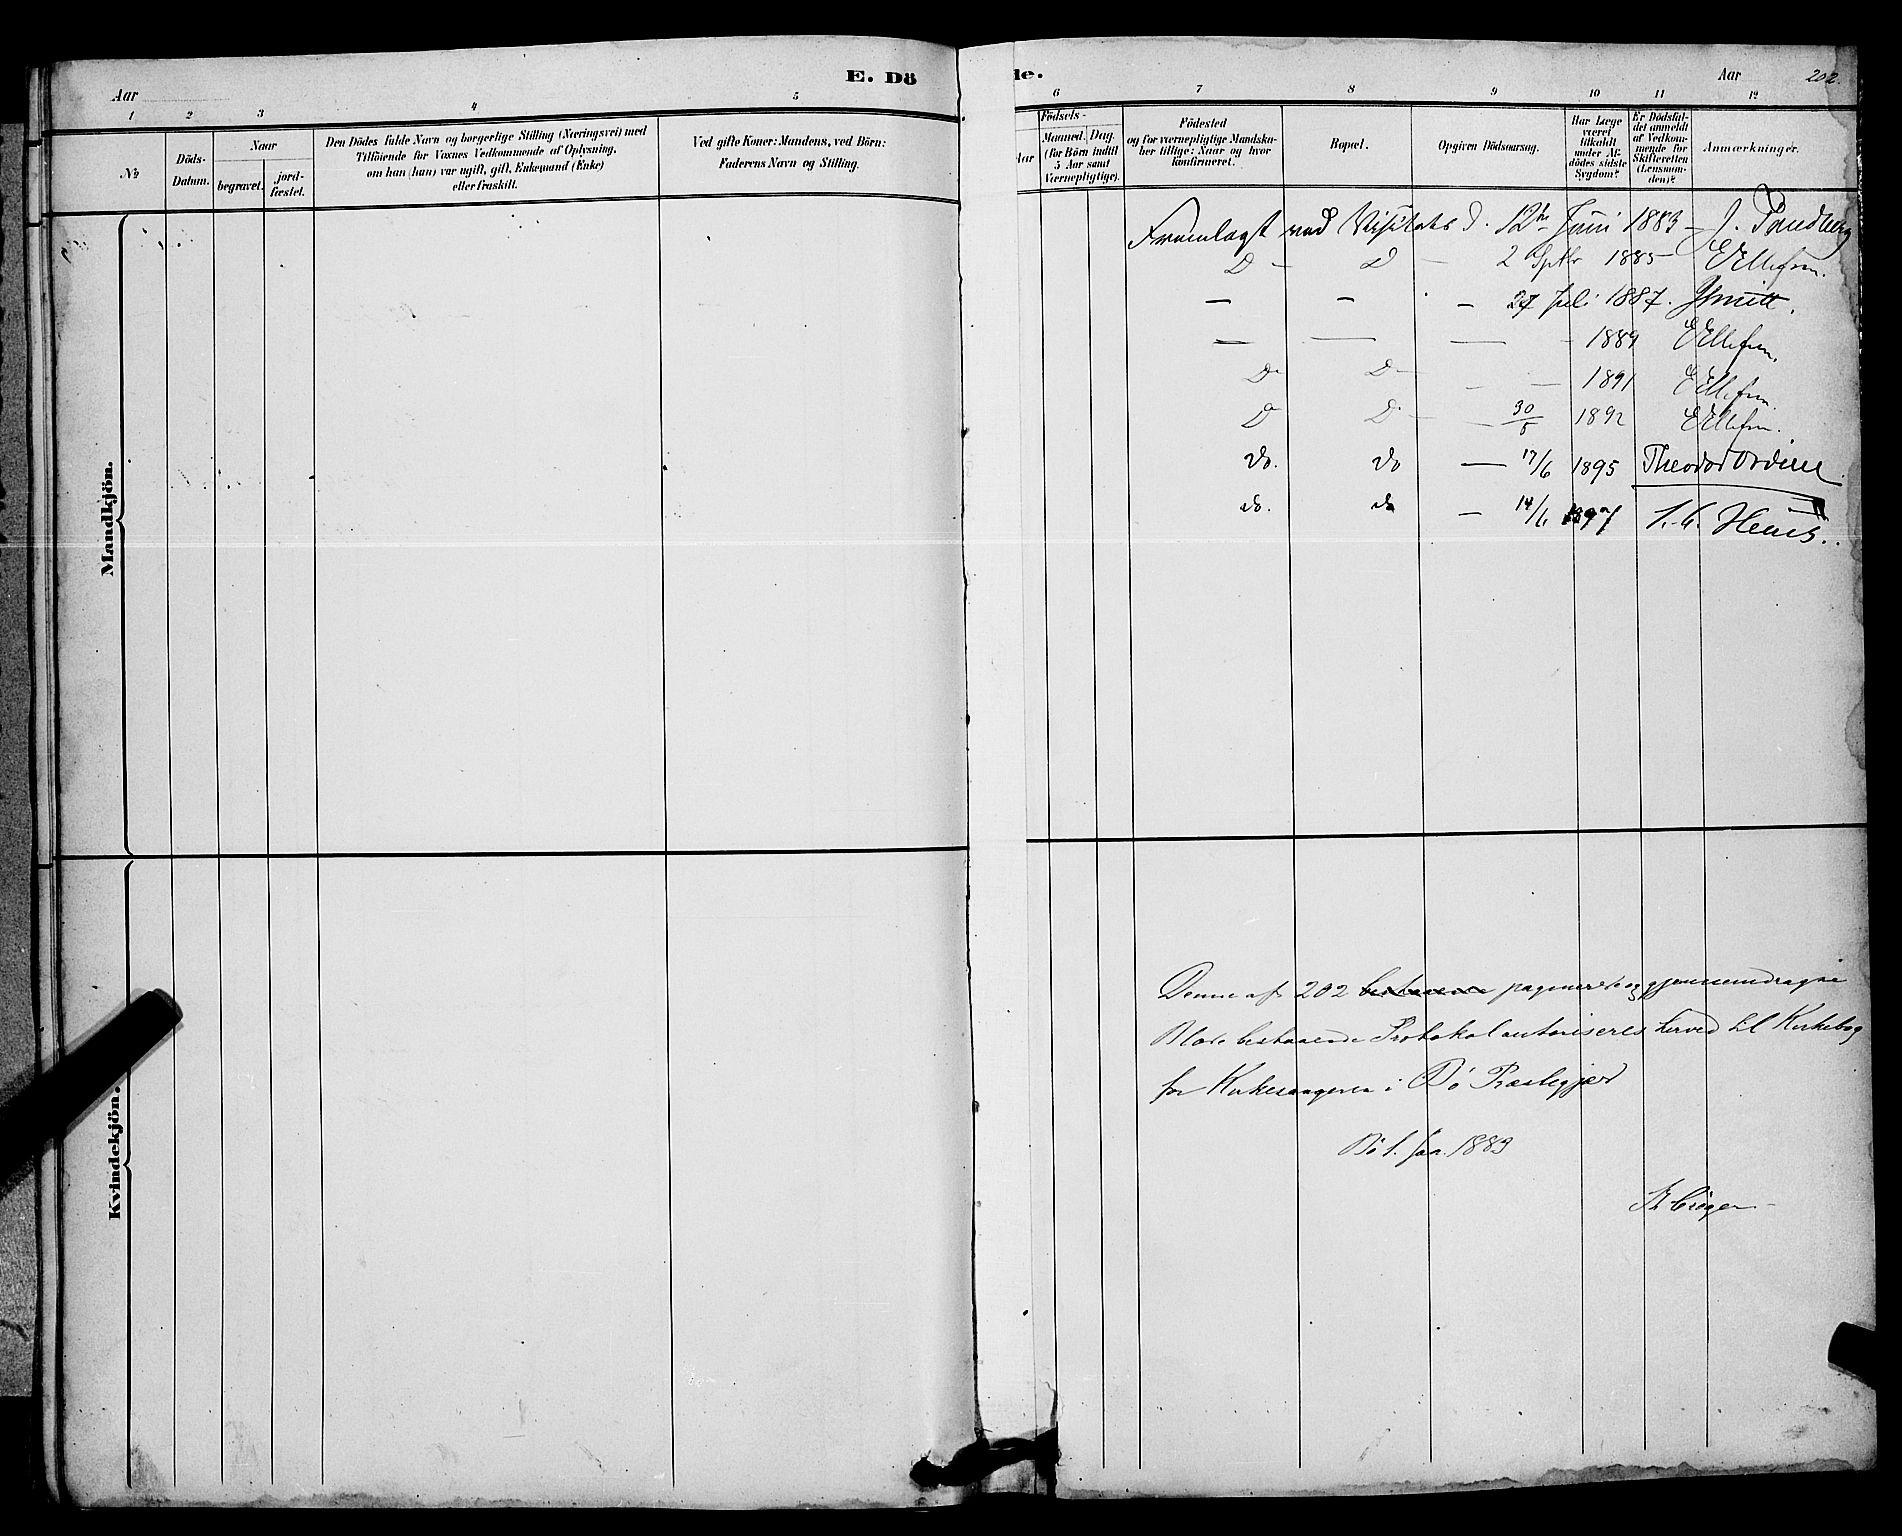 SAKO, Bø kirkebøker, G/Ga/L0005: Klokkerbok nr. 5, 1883-1897, s. 202